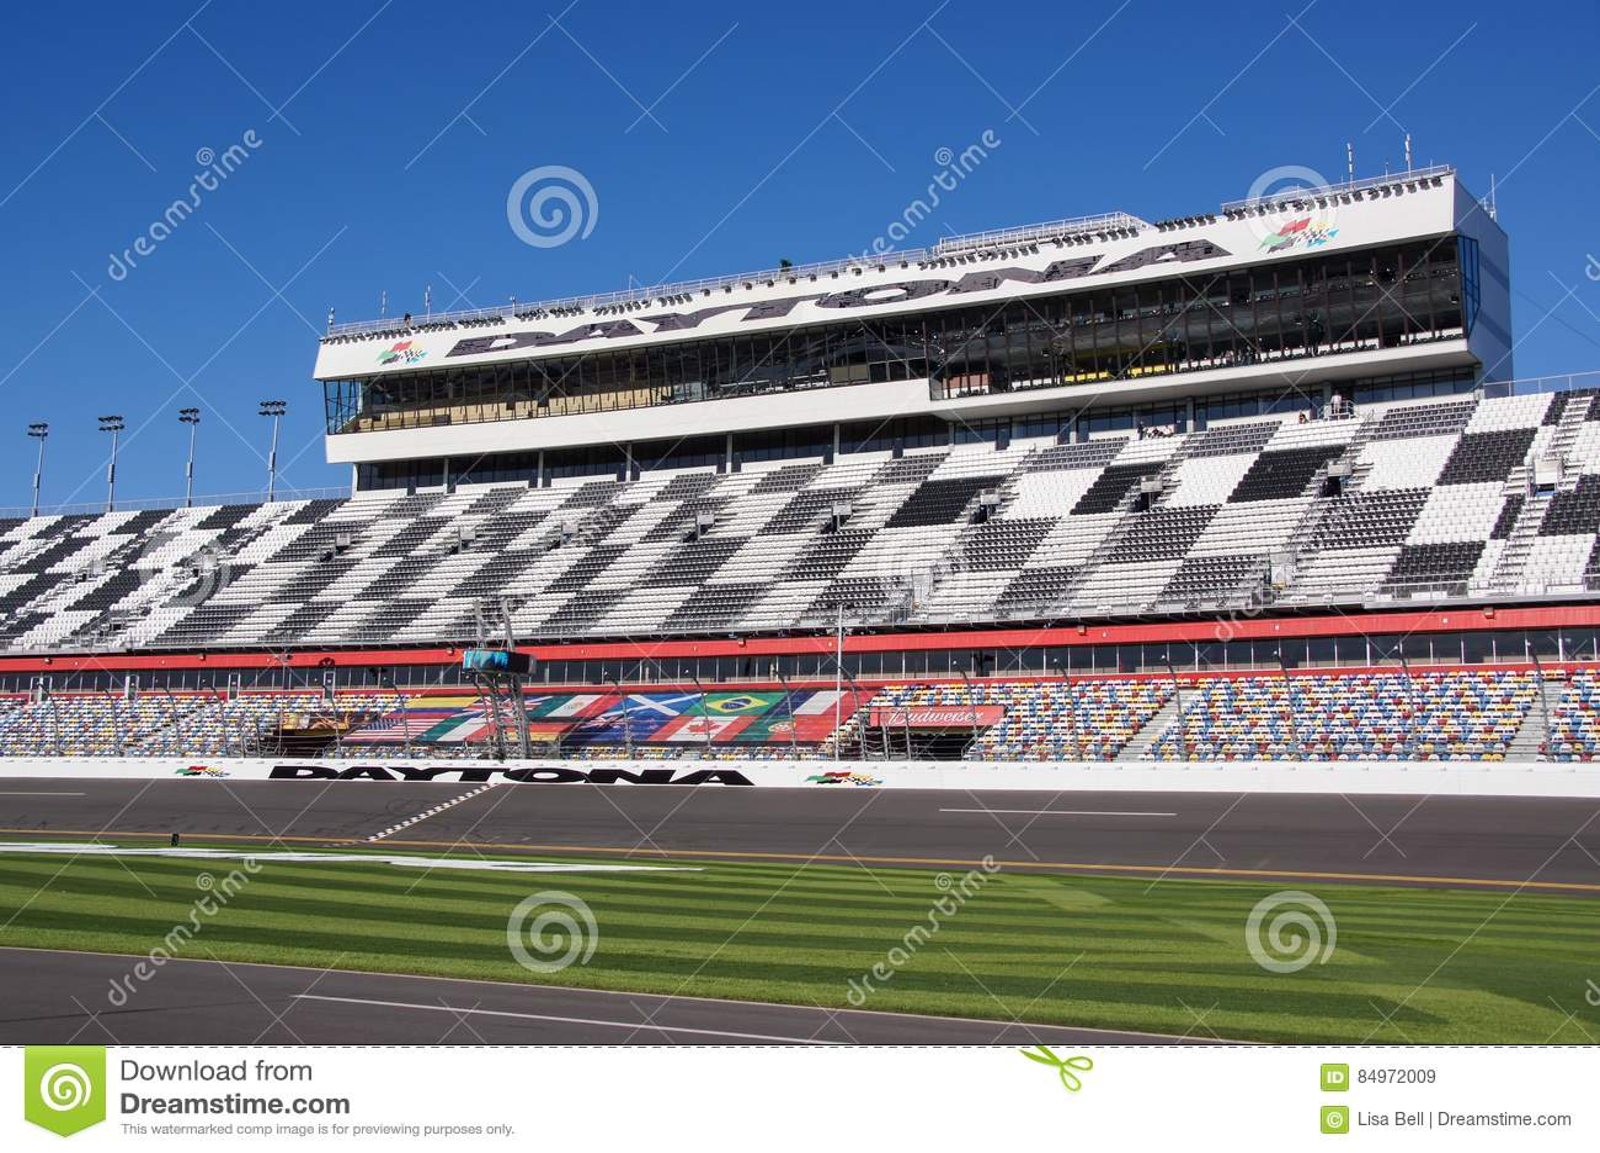 Daytona Motor Speedway Seating Chart Impremedia Net